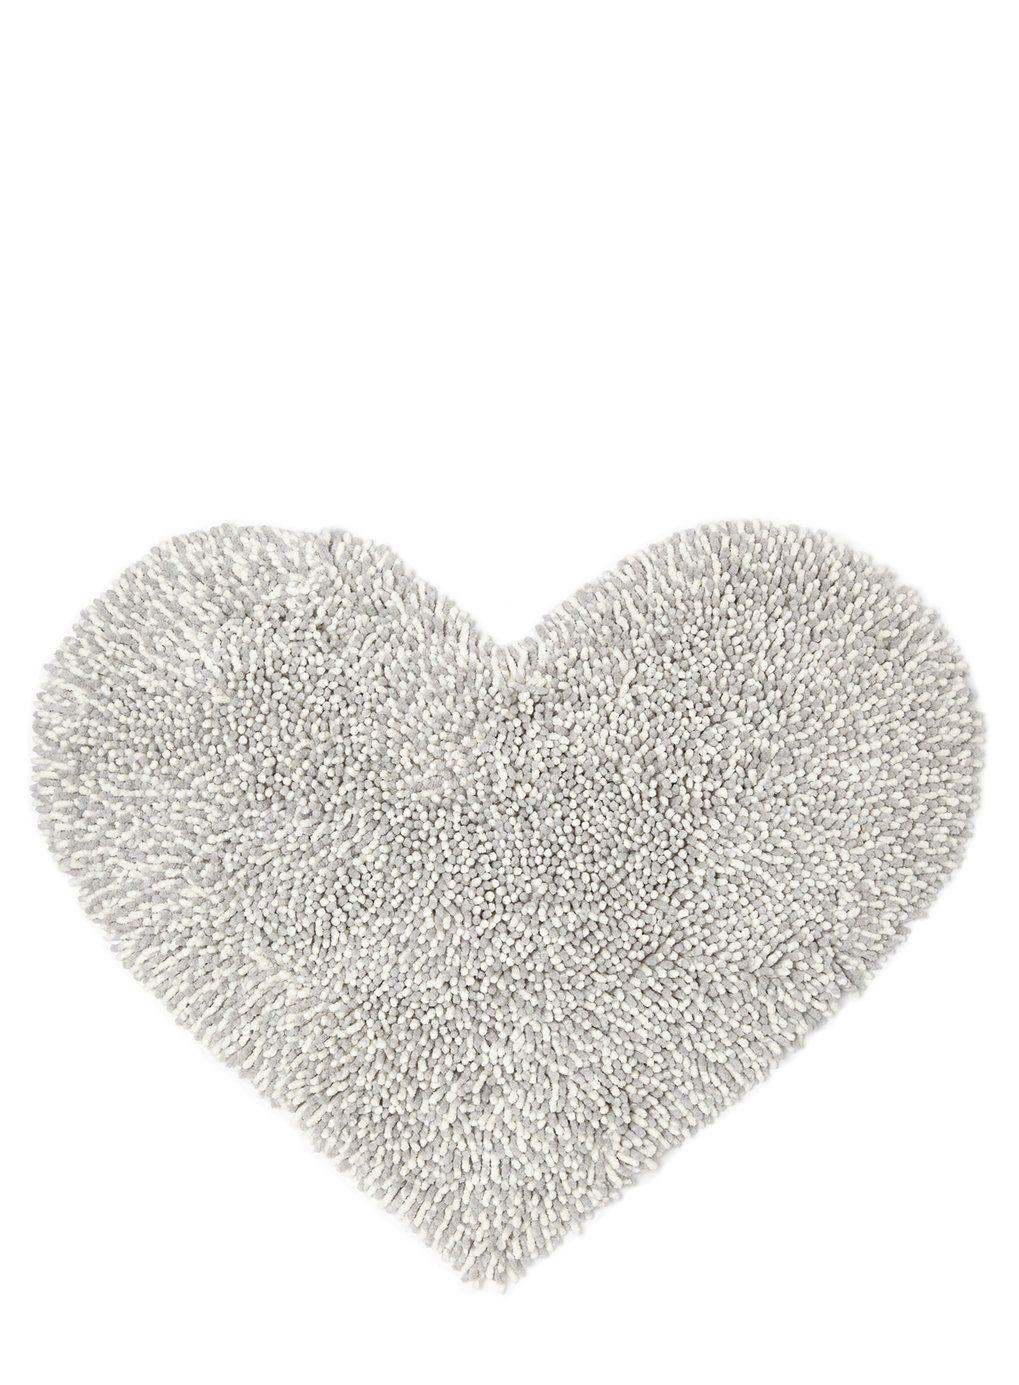 Bhs Bathroom Storage Soft Grey Chenille Heart Mat Bhs Alb1600 Suppiles Pinterest